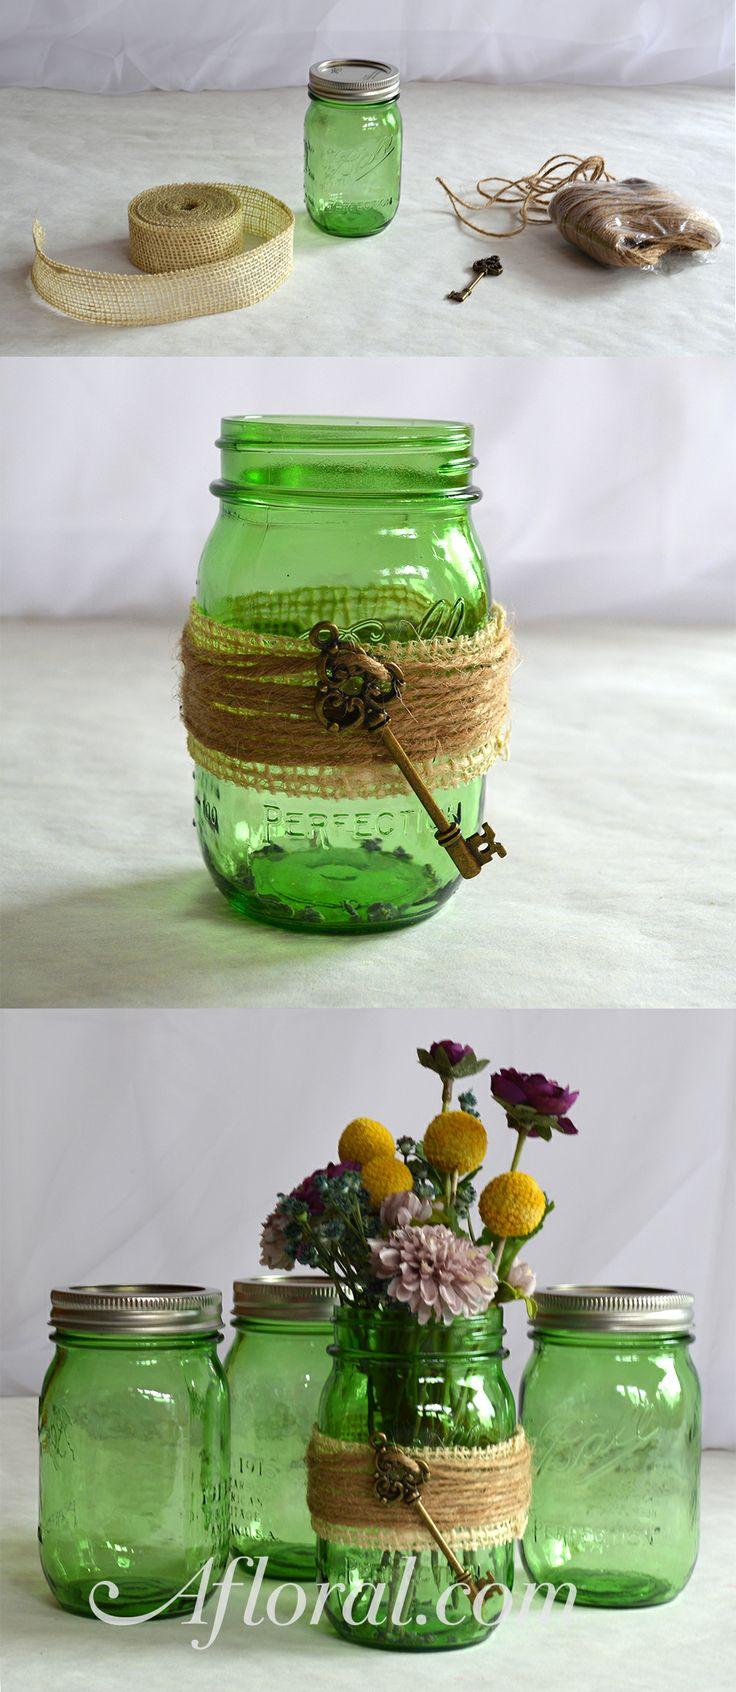 DIY these green mason jar wedding centerpieces! Supplies: green mason jars, burlap ribbon, faux keys, and your favorite rustic silk blooms!